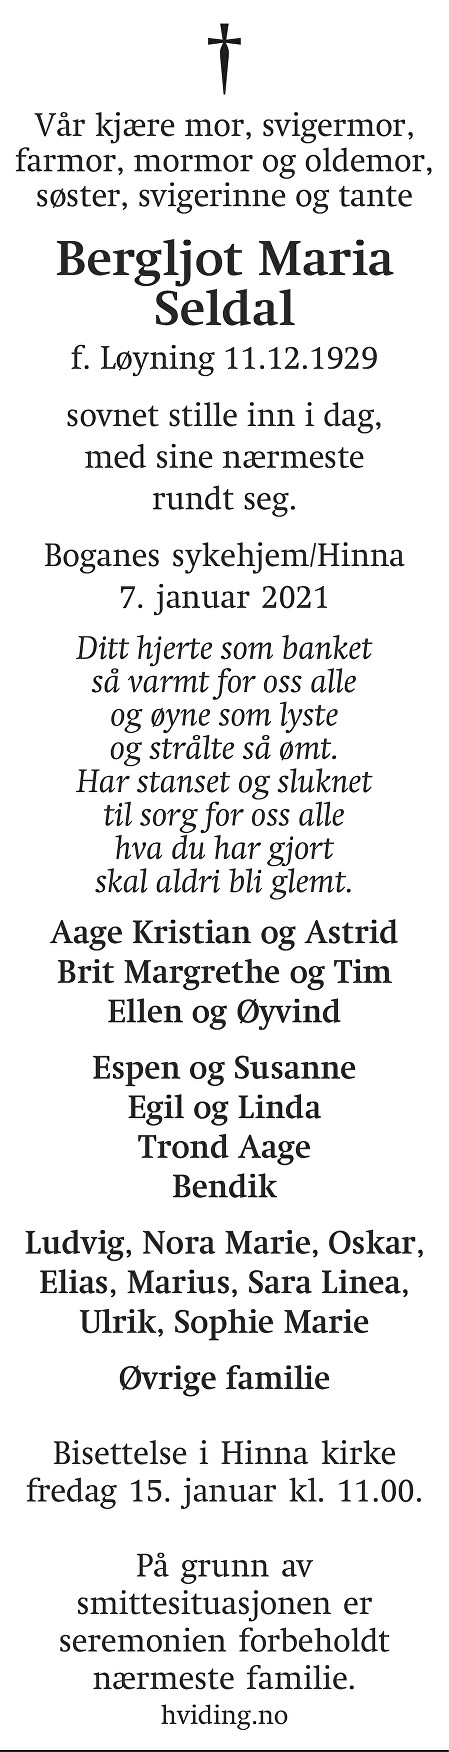 Bergljot Maria Seldal Dødsannonse